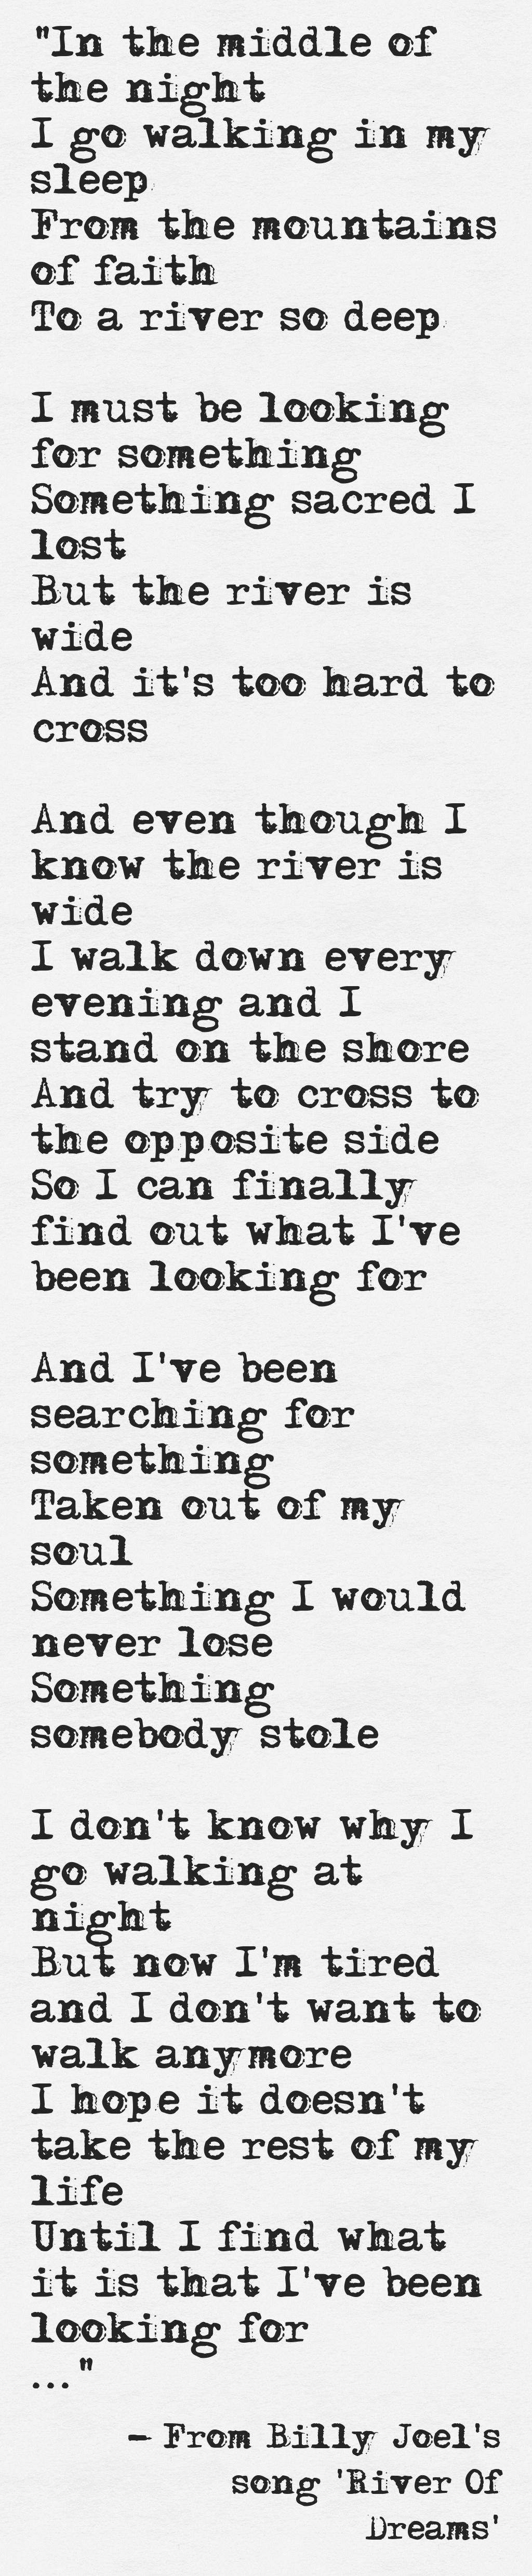 Joel Osteen Quotes 006 Billy Joel Lyrics Love Songs Lyrics